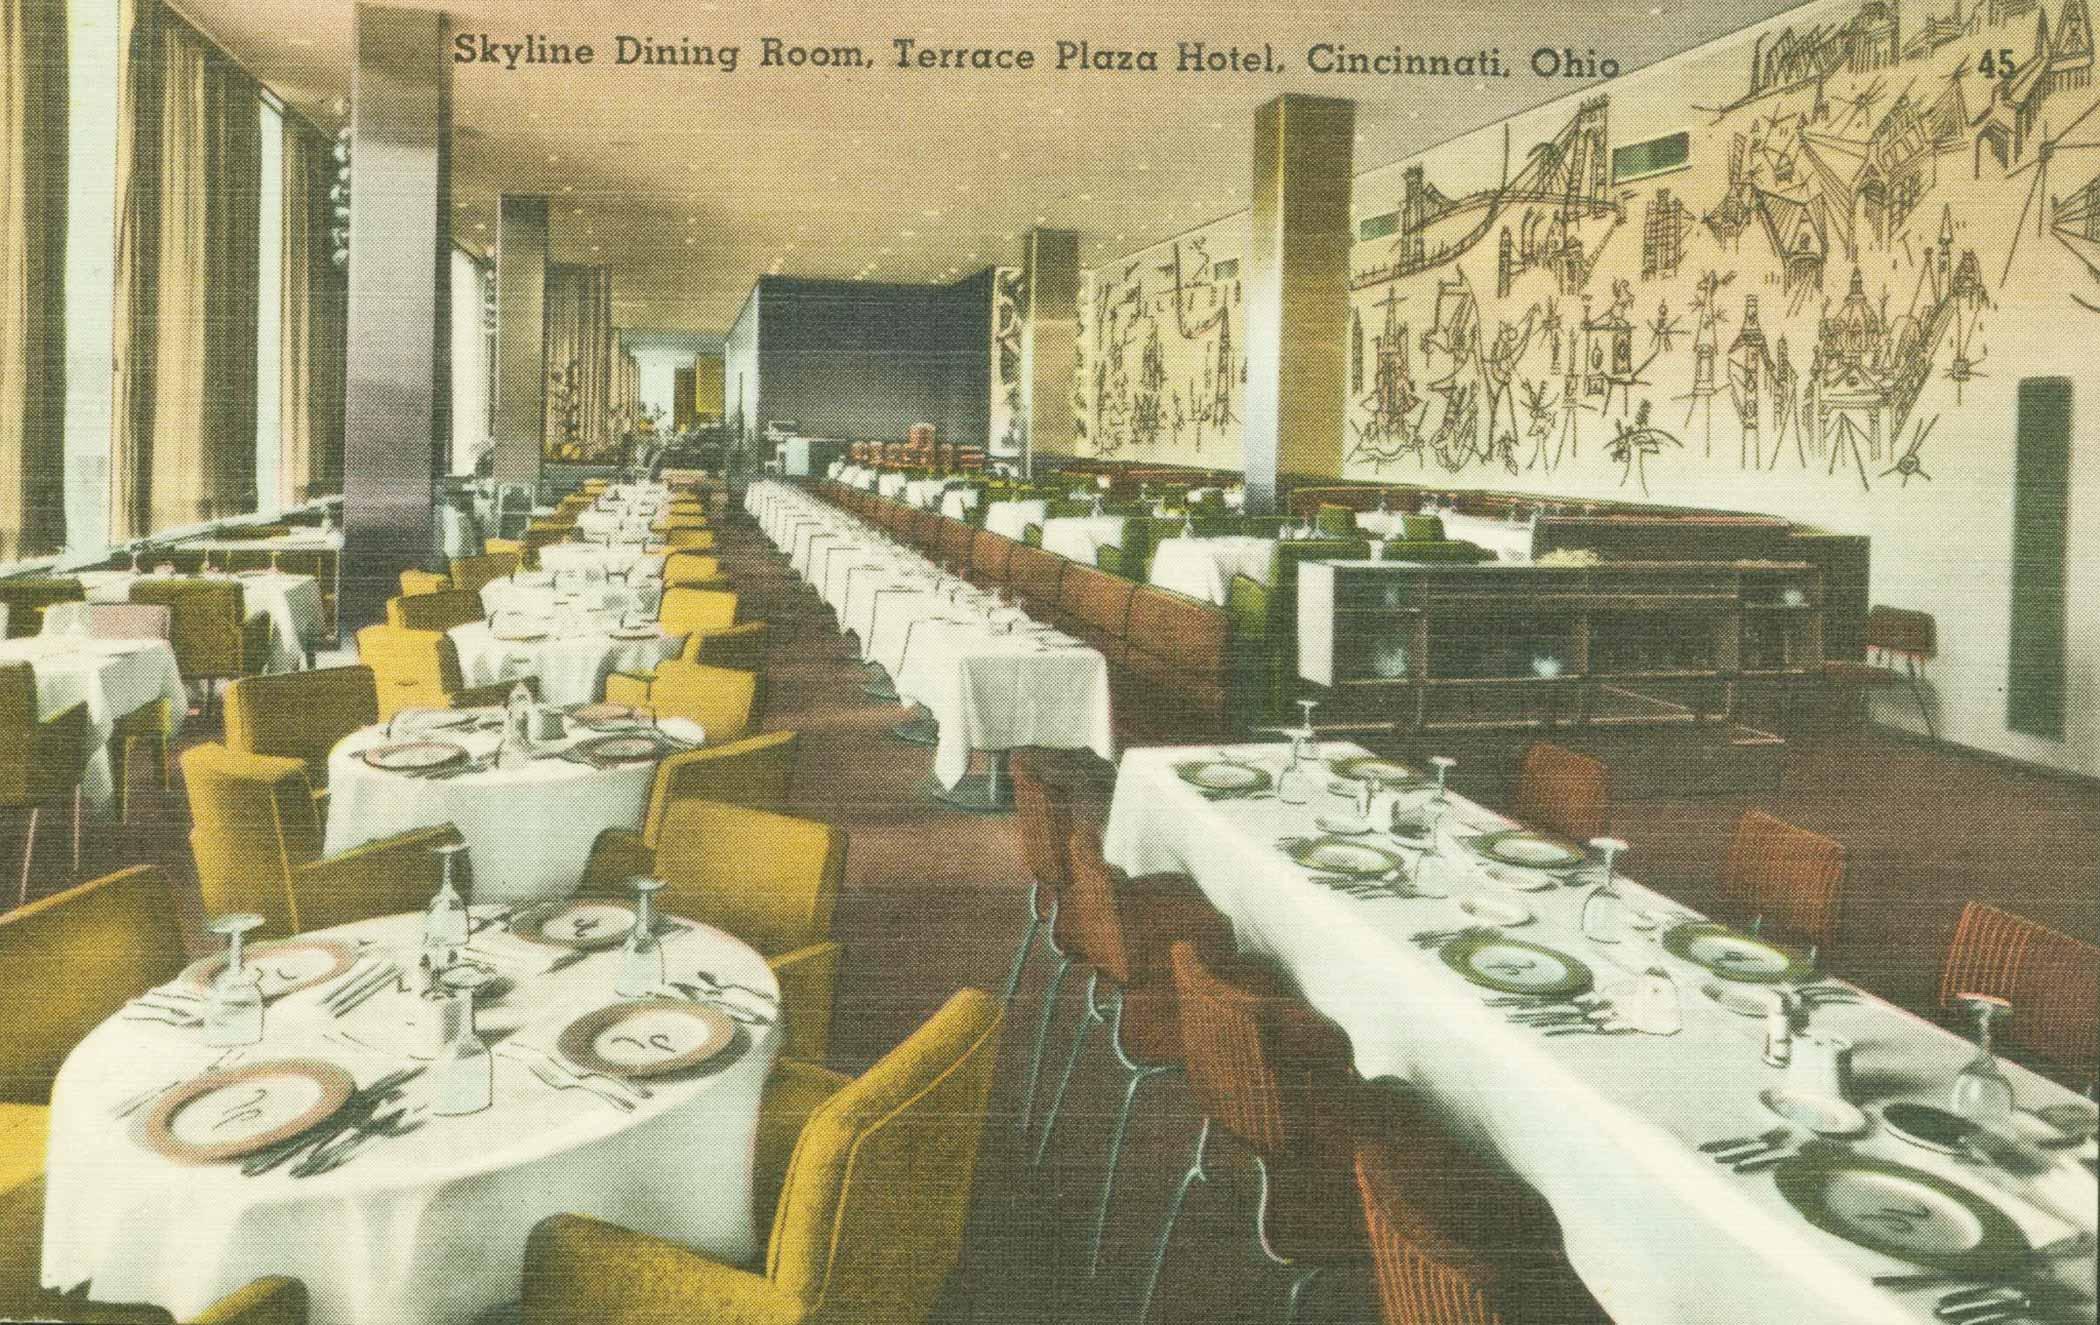 Postcard, c. 1950, of the Skyline Room with Steinberg's mural, Terrace Plaza Hotel, Cincinnati.